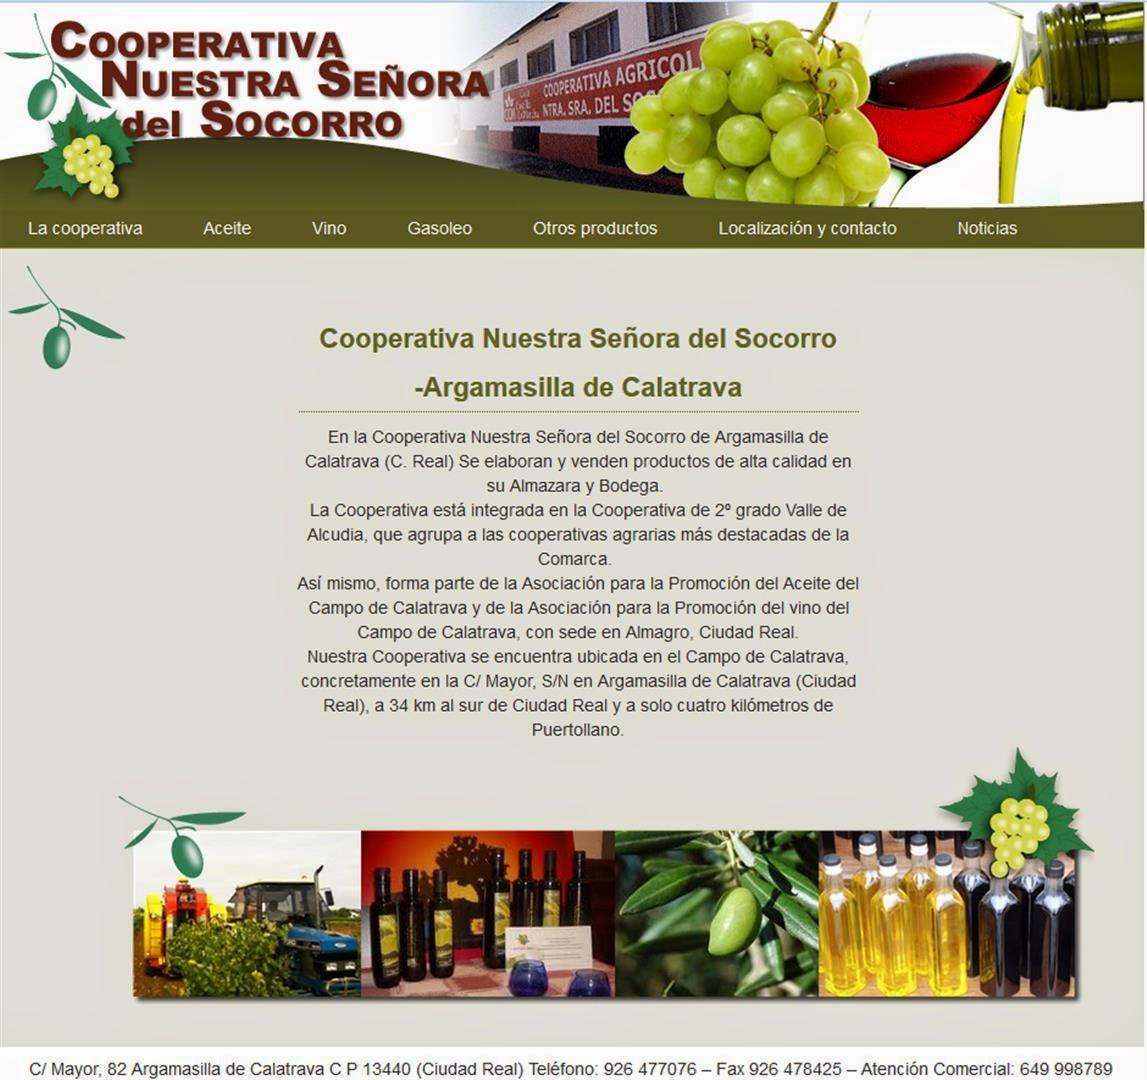 http://www.cooperativanuestrasenoradelsocorro.es/